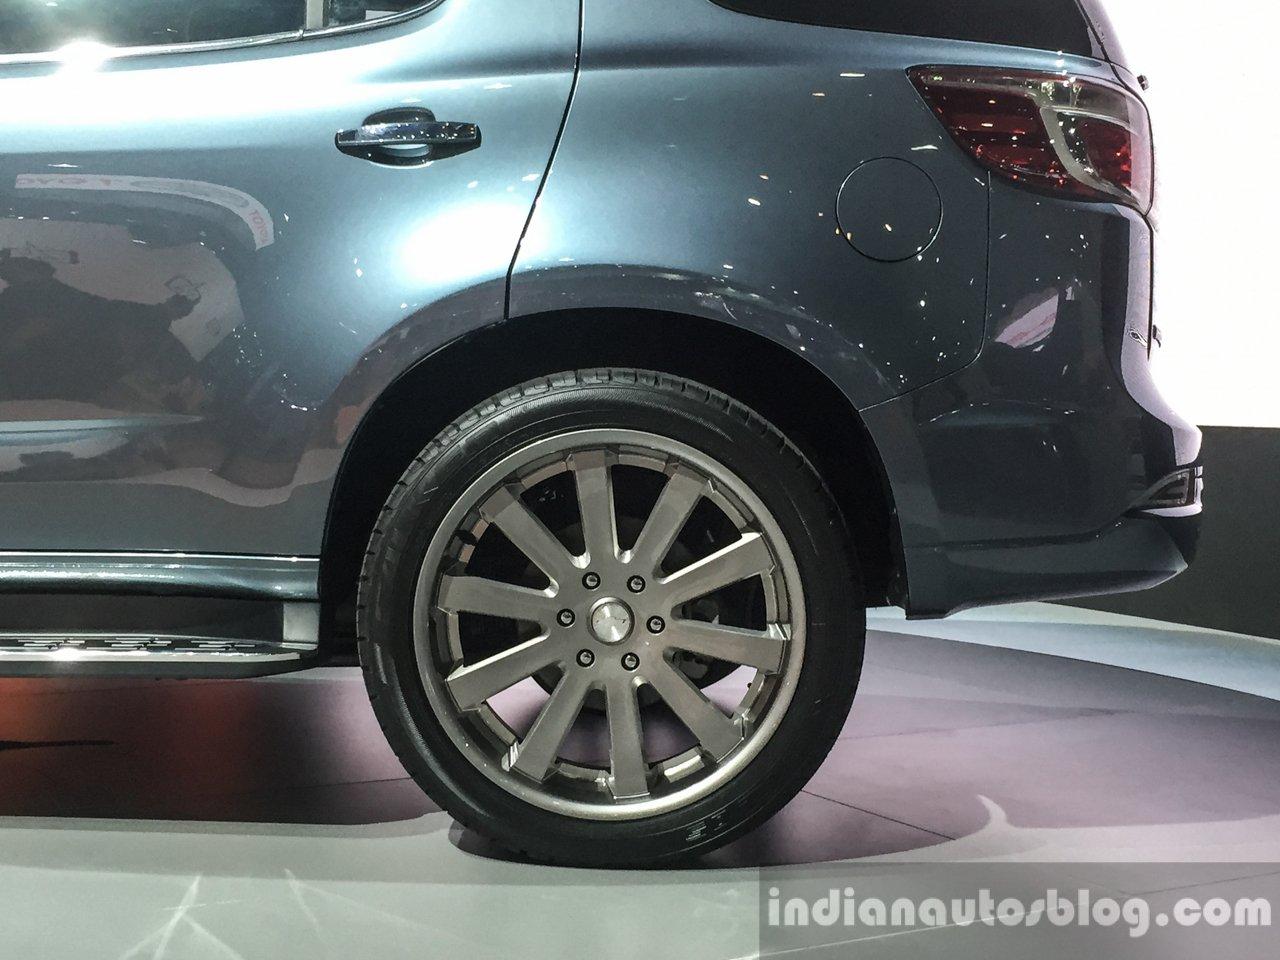 2016 Chevrolet Trailblazer Premier (facelift) wheel at 2016 BIMS